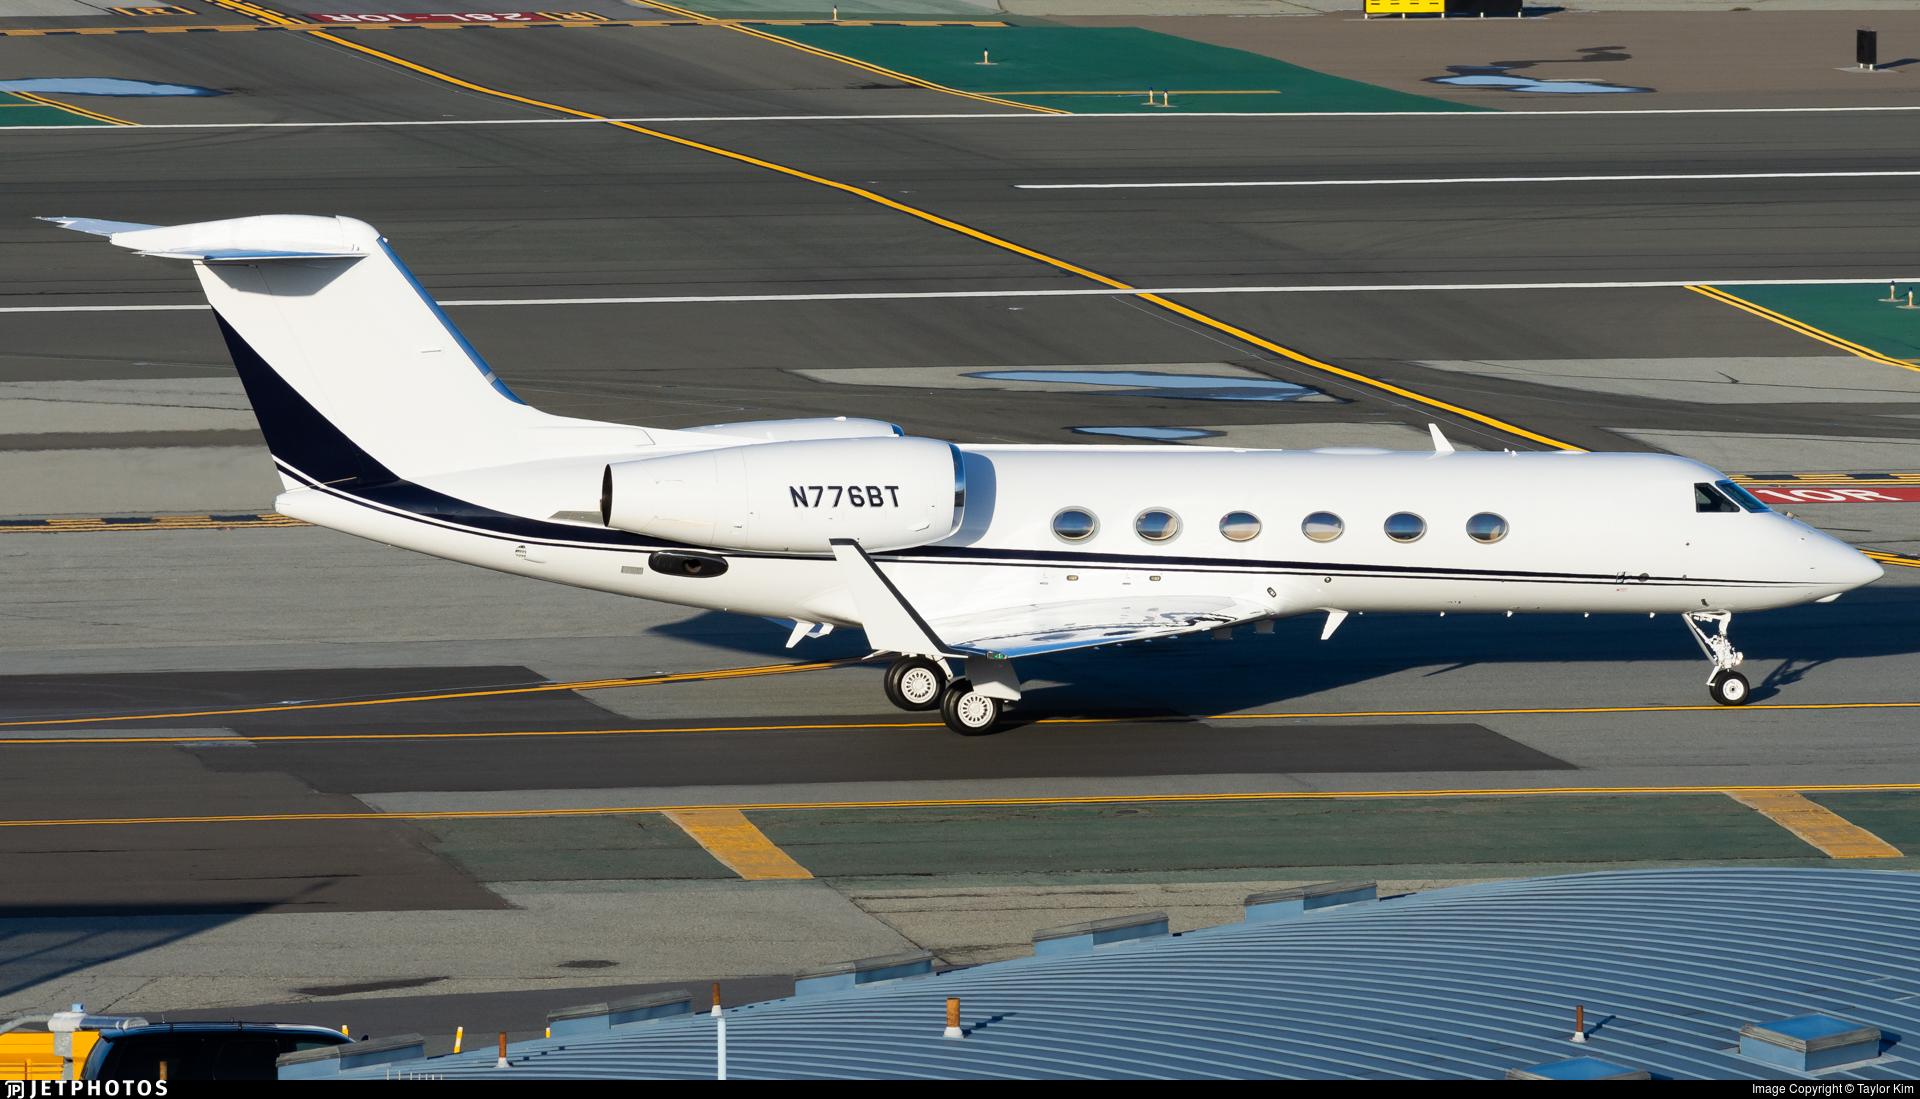 N776BT - Gulfstream G450 - Private